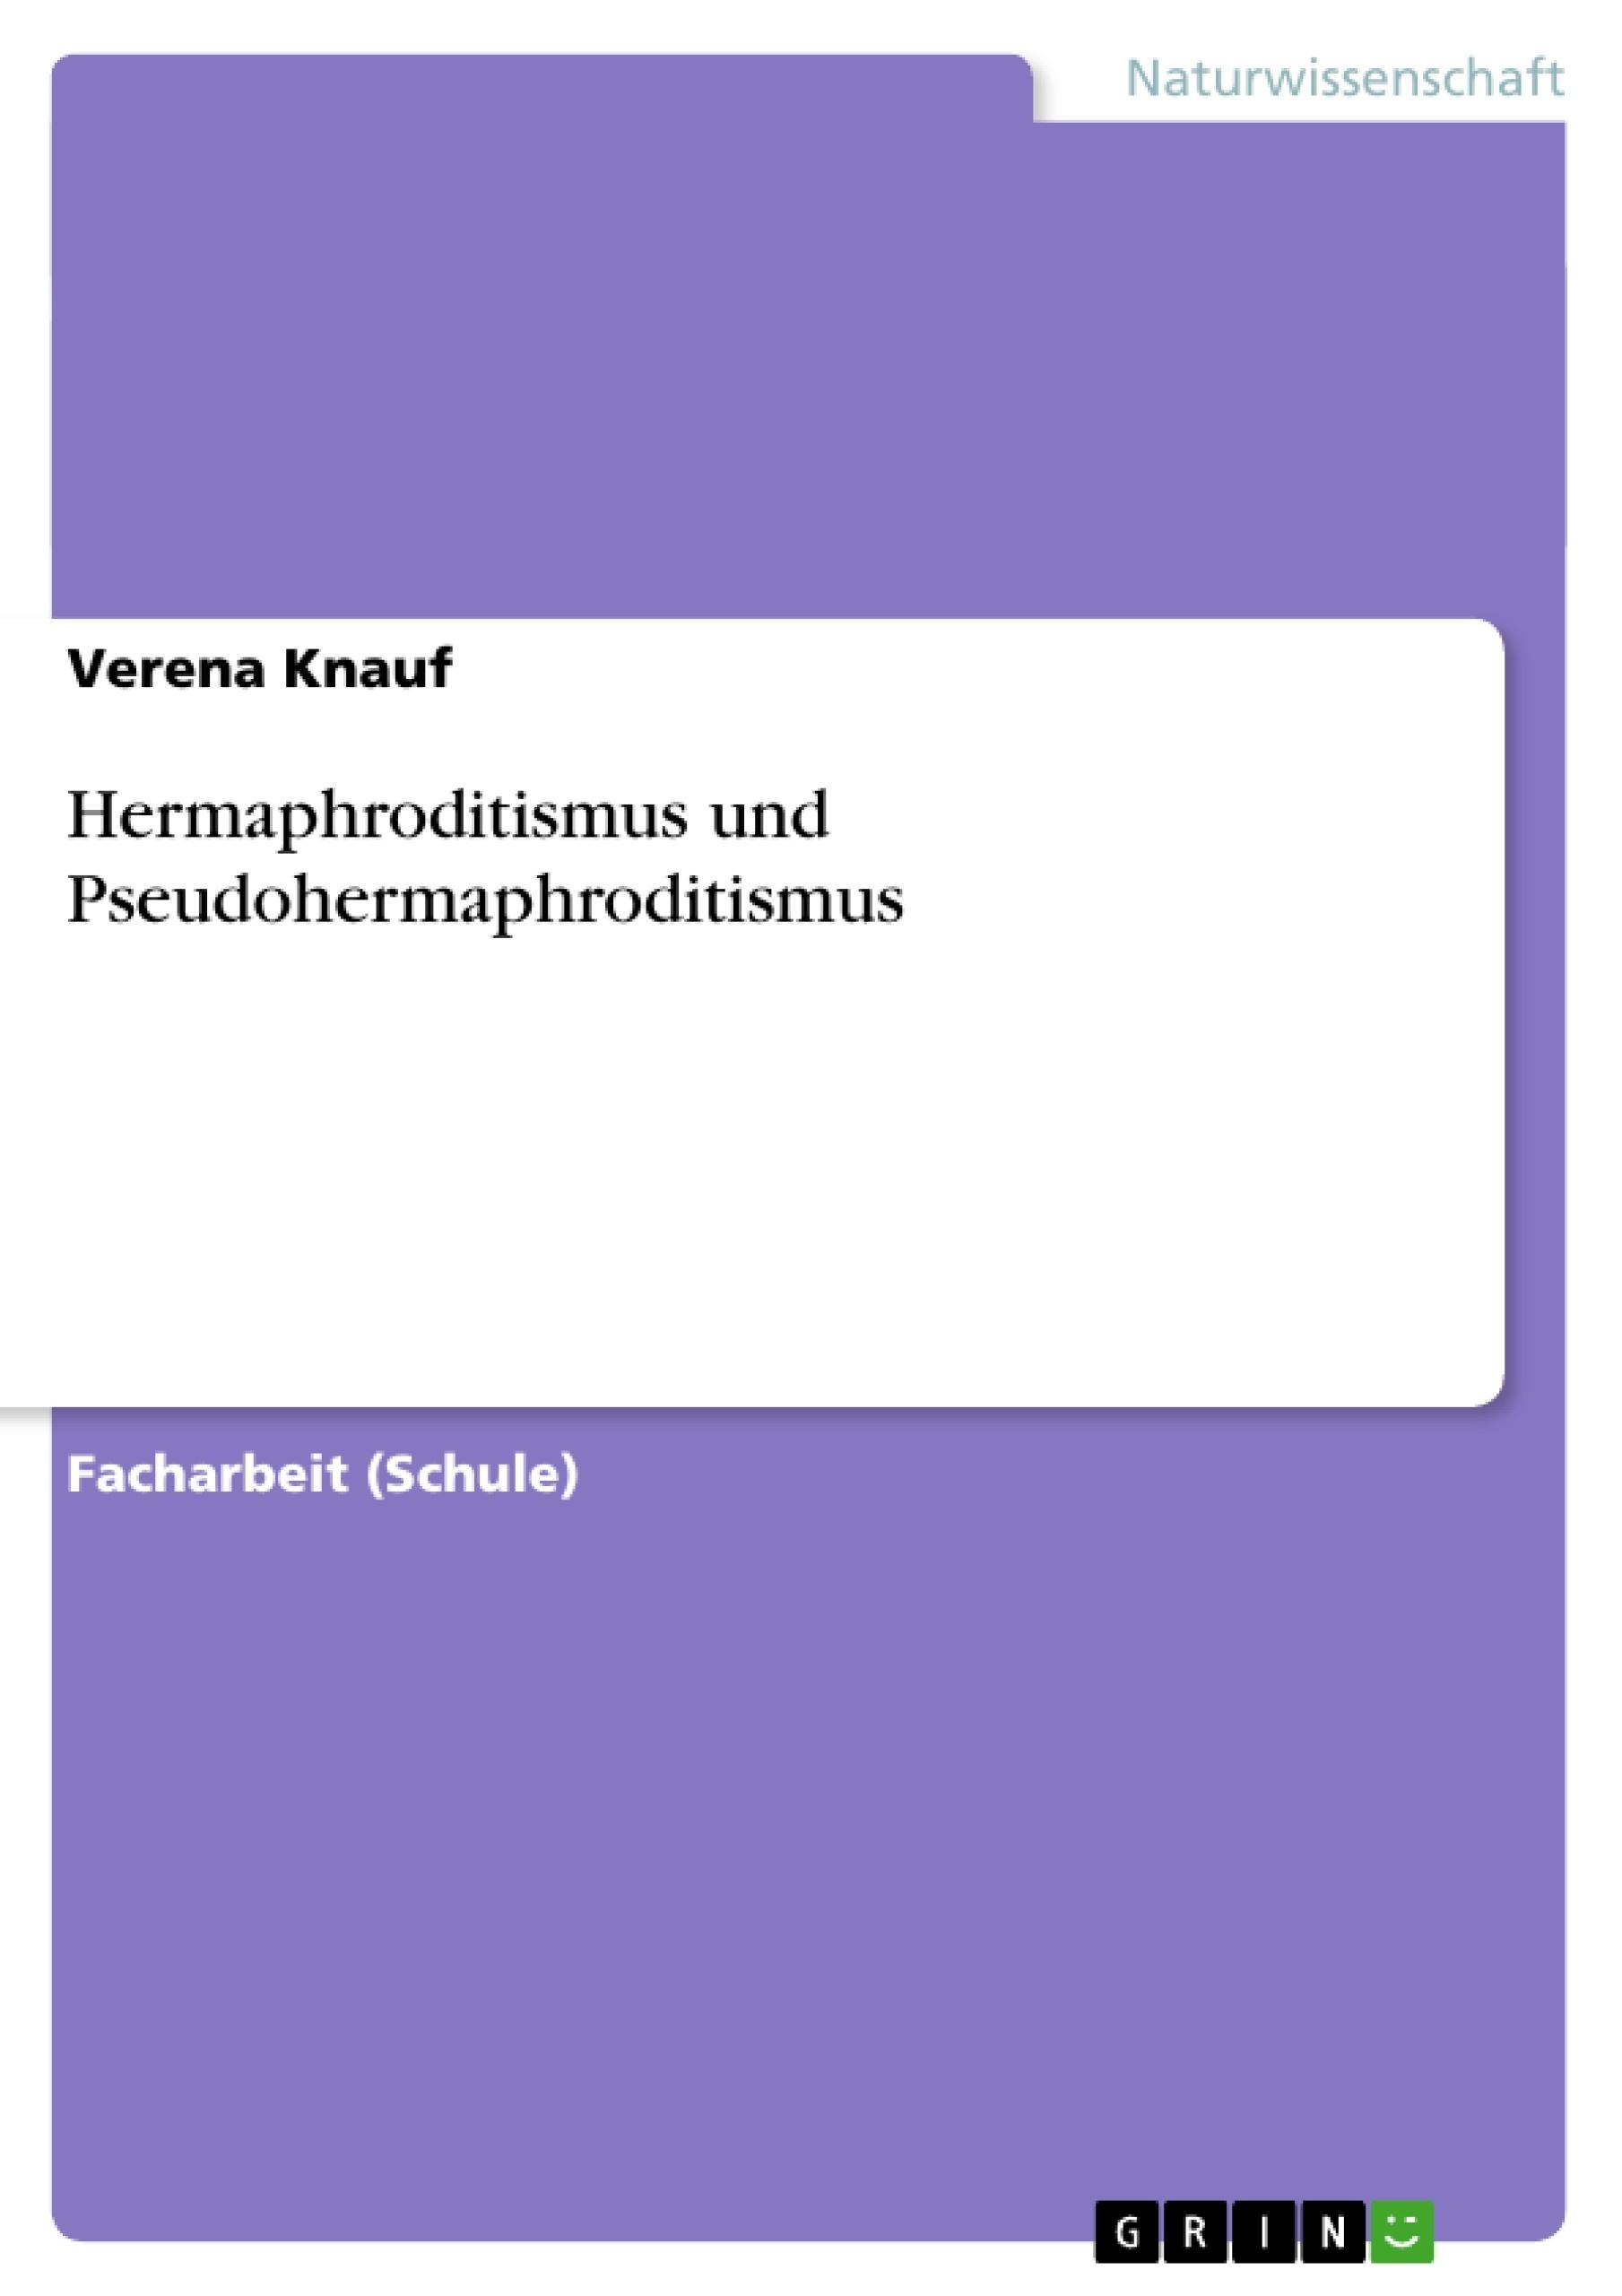 "HERMAPHRODITISMUS VERUS ""ECHTE ZWITTER"